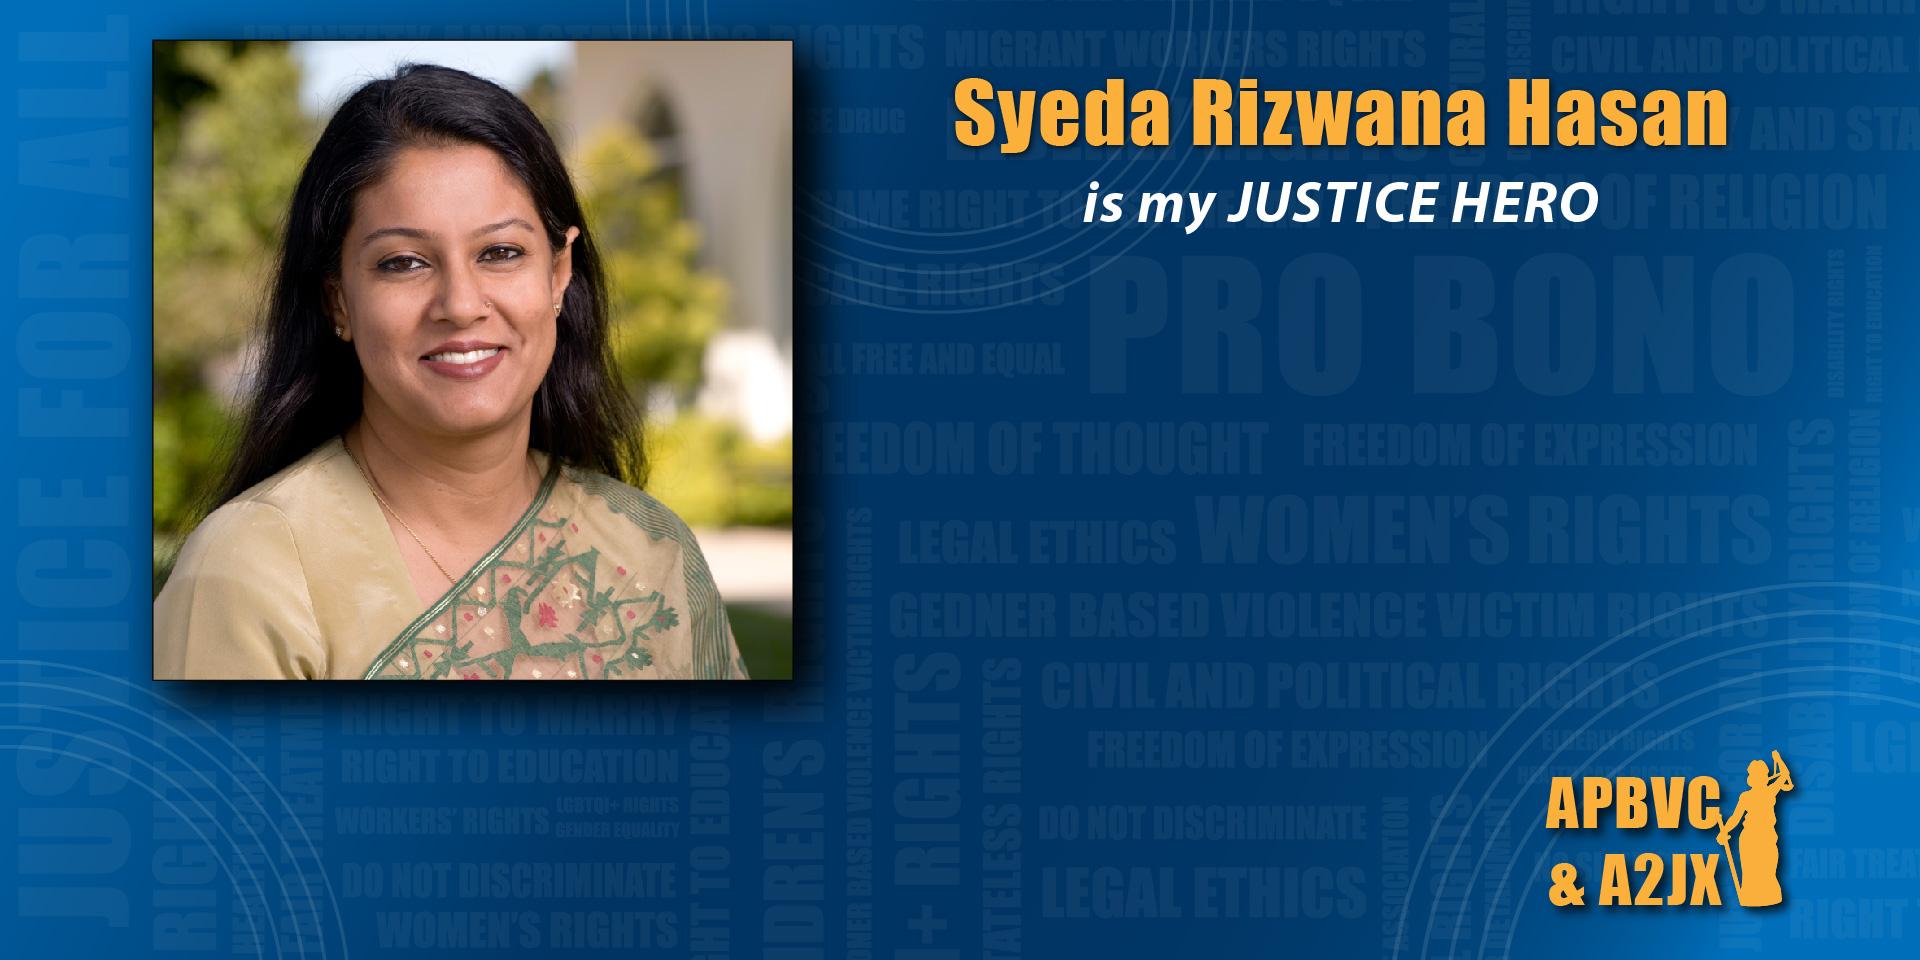 Syeda Rizwana Hasan